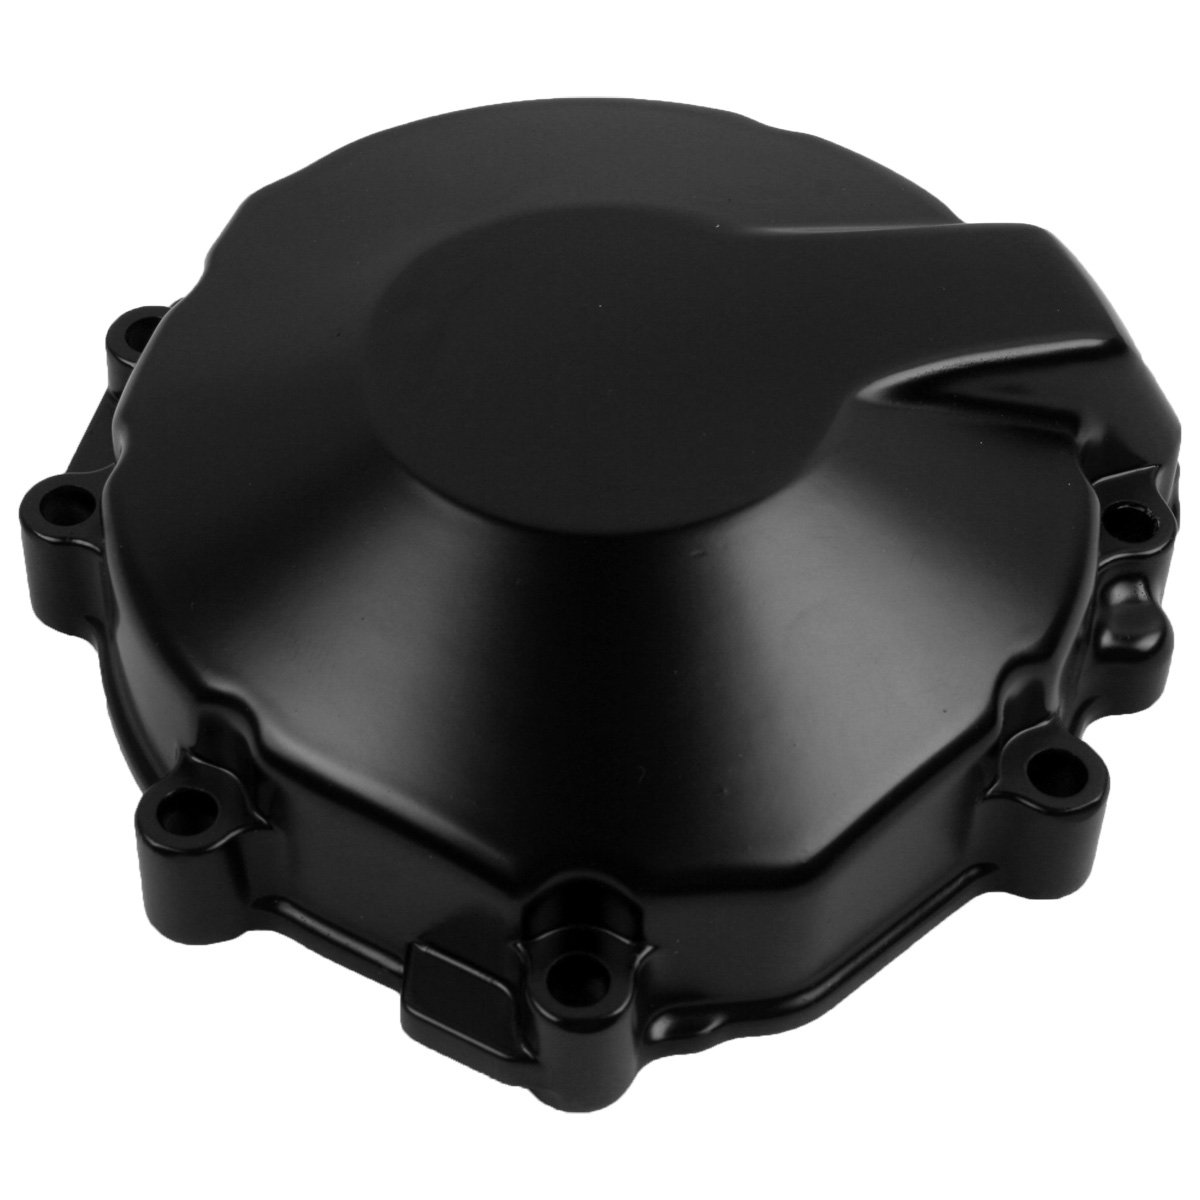 XMT-MOTO Engine Stator Cover Crankcase For Kawasaki Ninja ZX6R ZX-6R 2009 2010 2011 2012 2013 2014